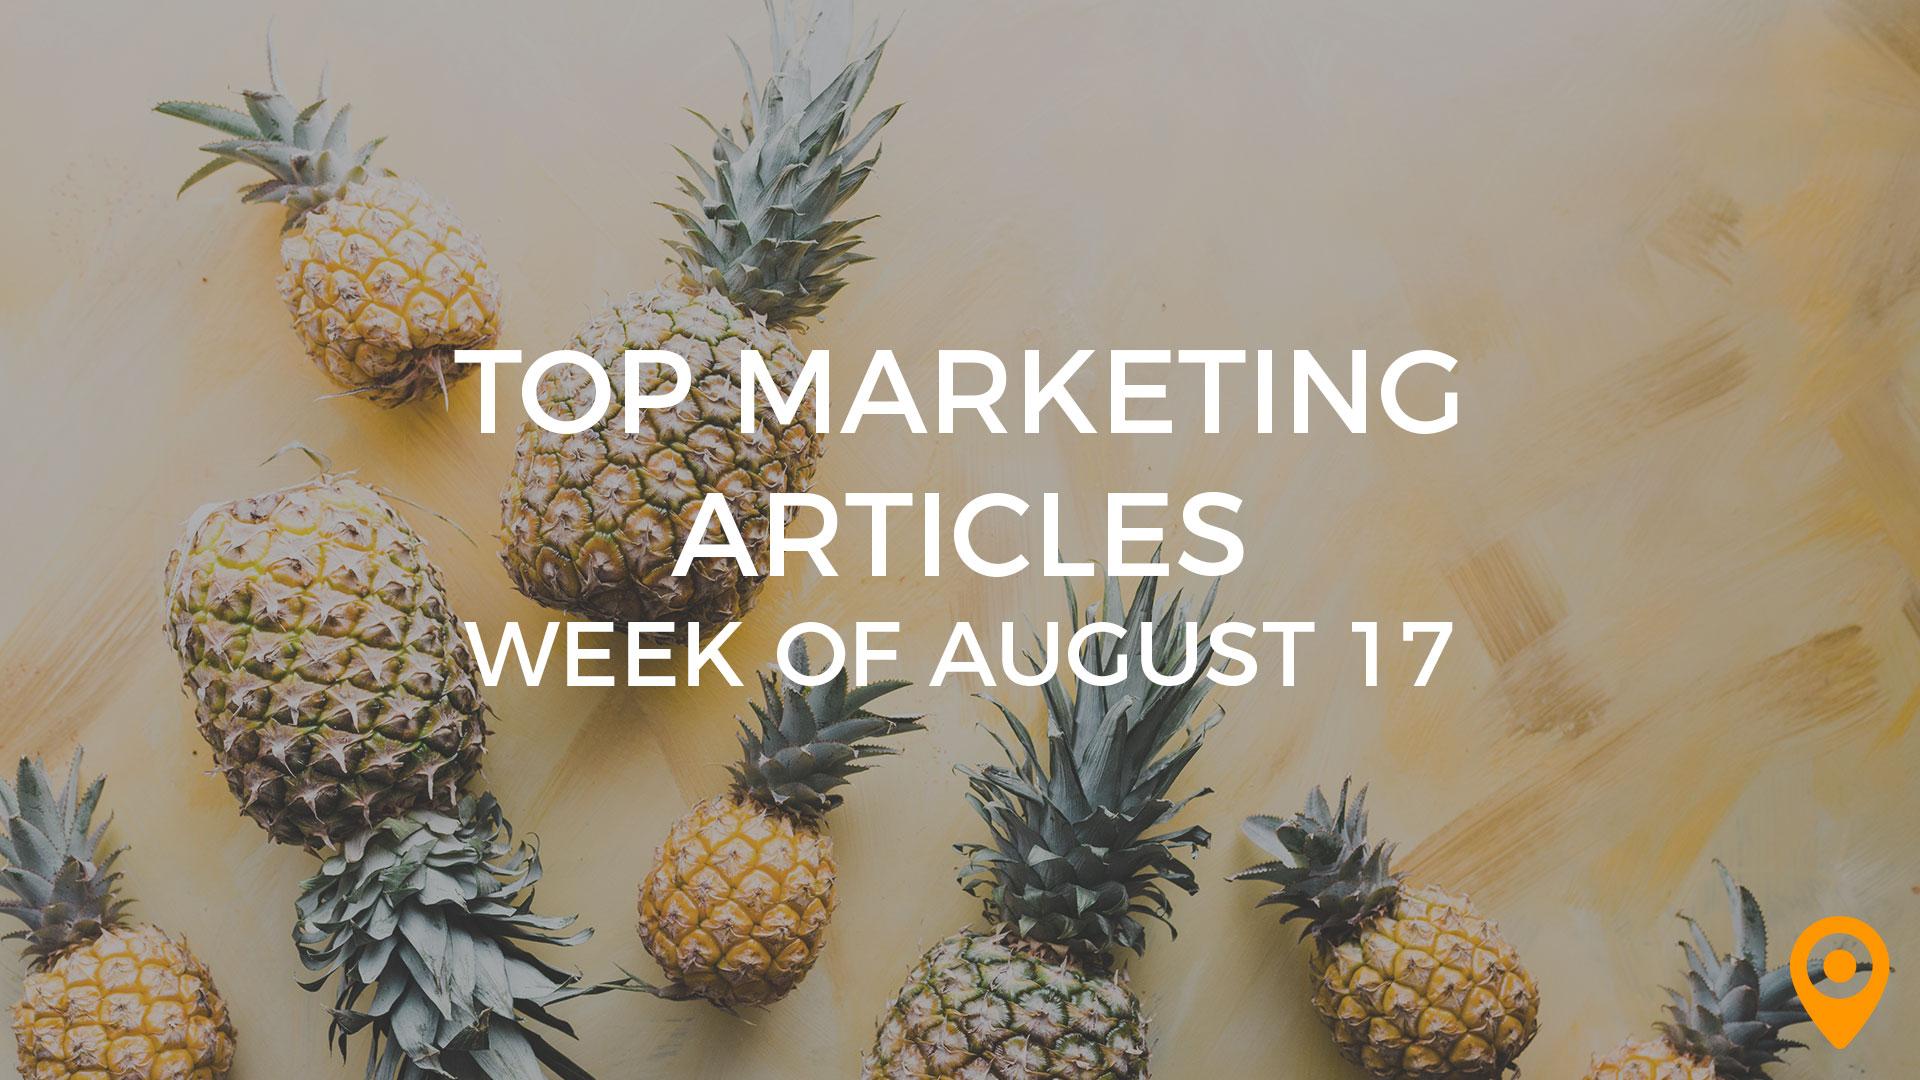 Top Marketing Articles-Week of August 17